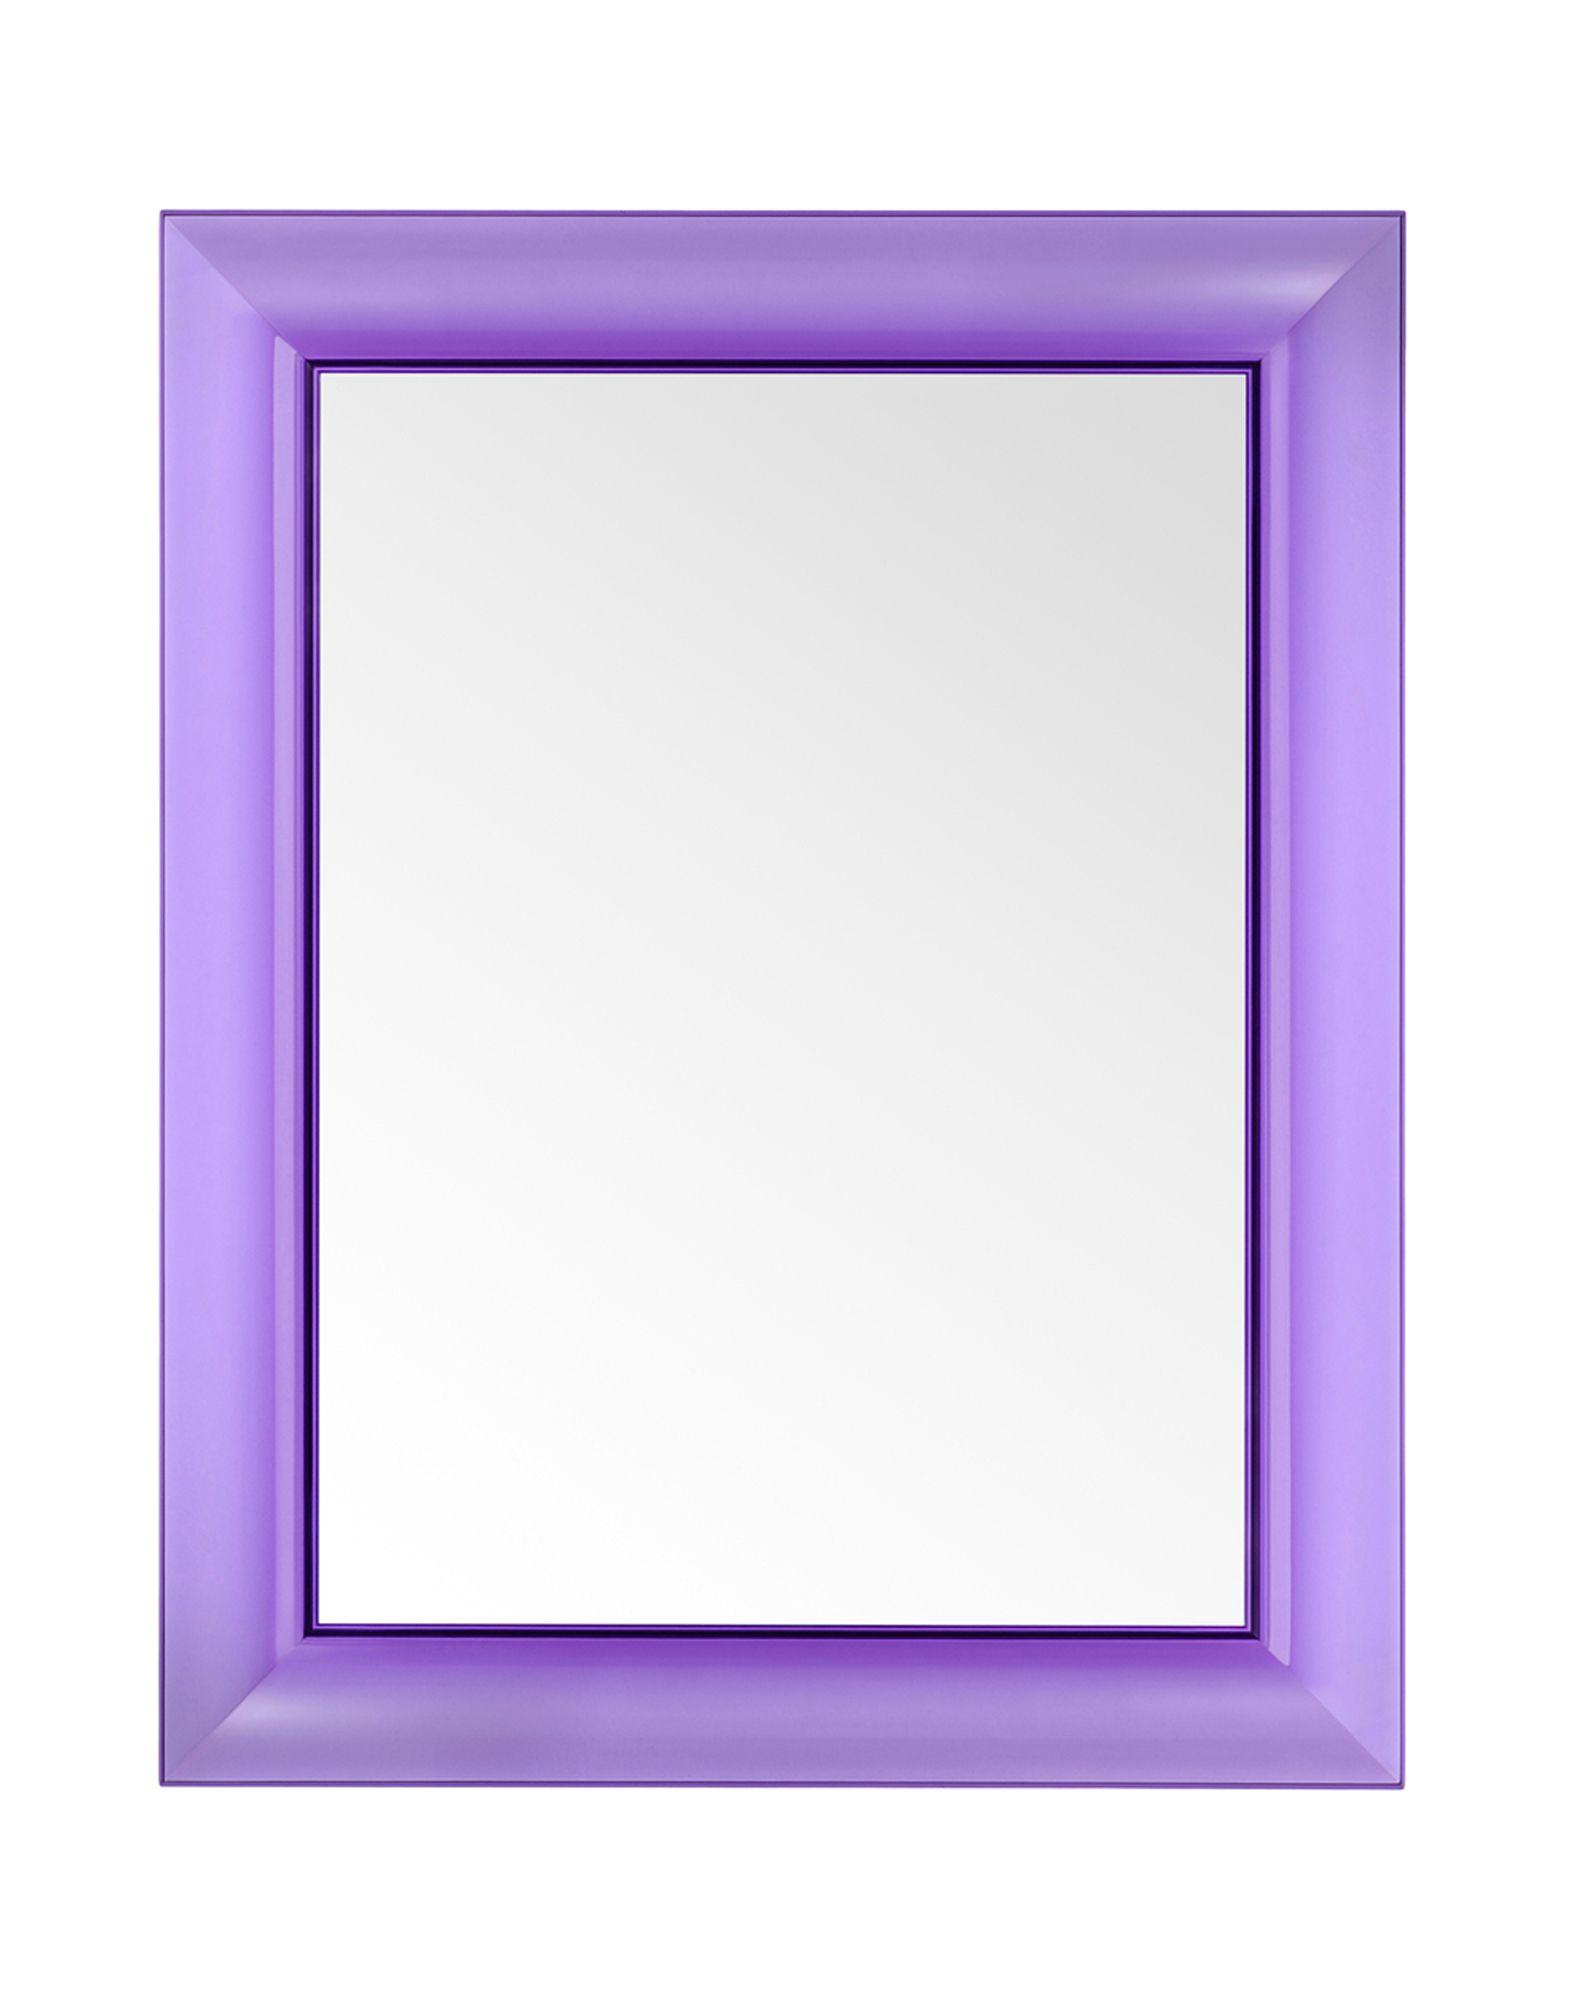 Kartell specchio francois ghost viola specchi newformsdesign - Kartell specchio ghost ...